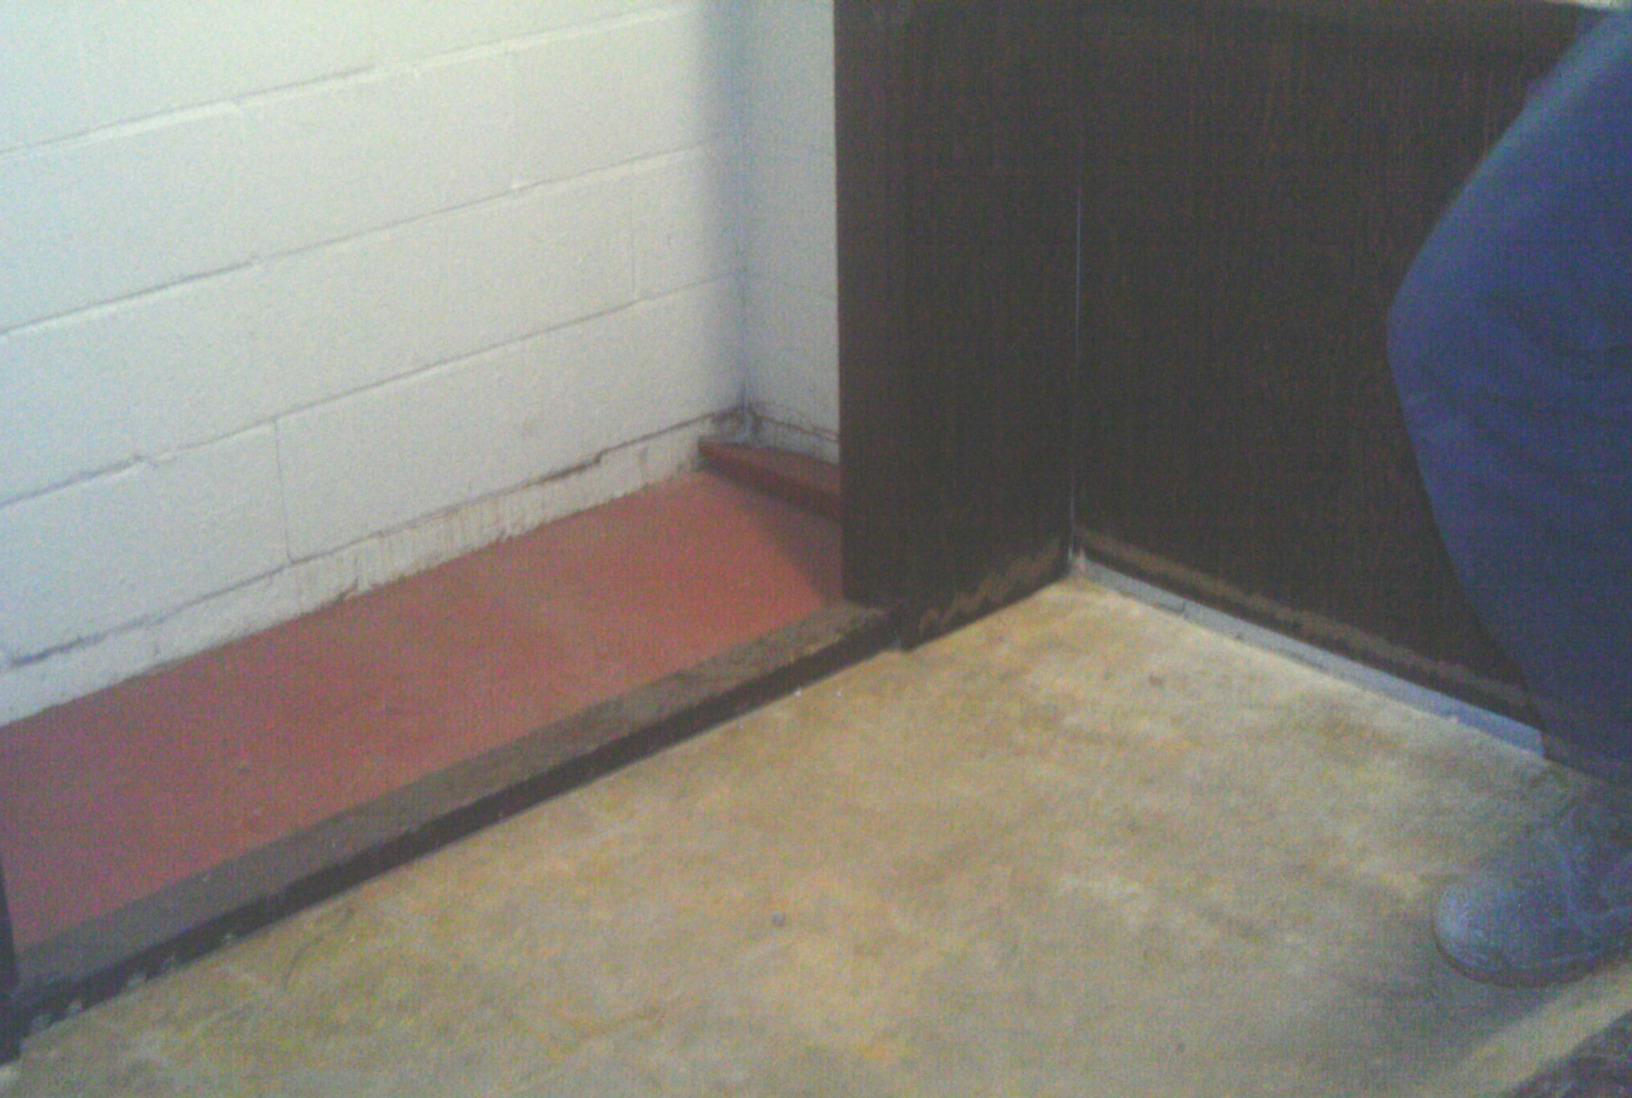 Part of the perimeter before waterproofing.